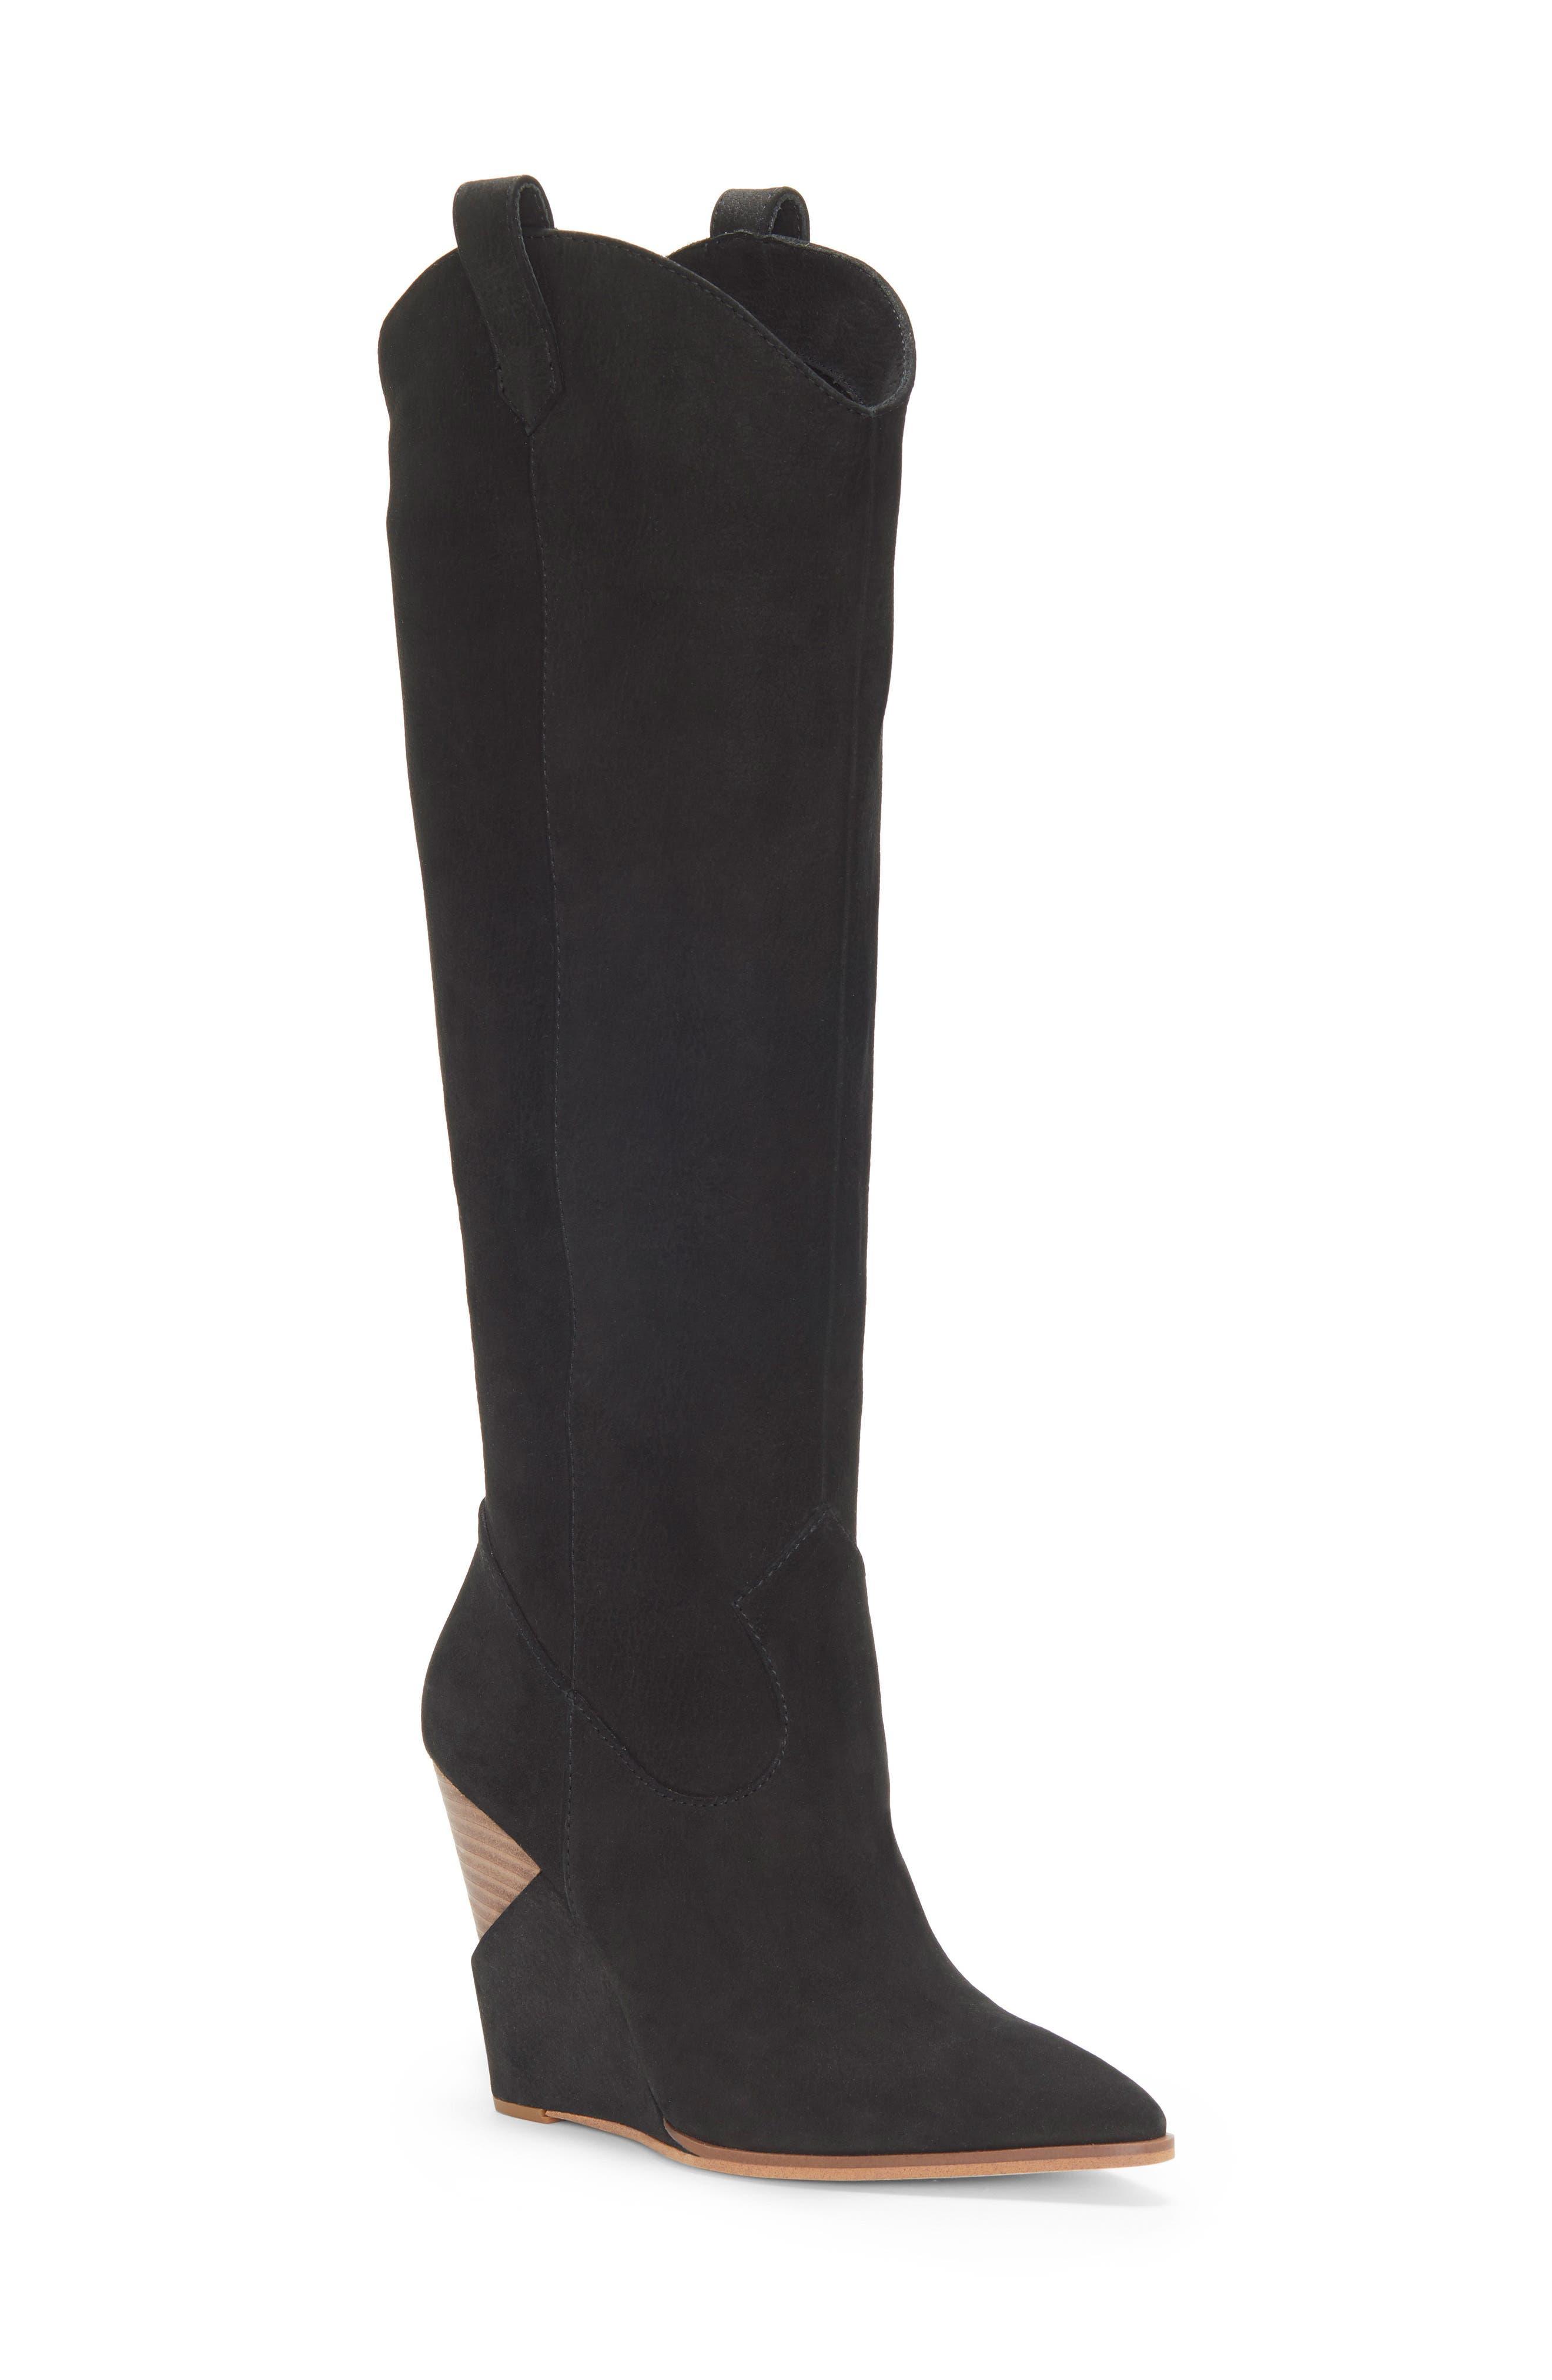 Jessica Simpson Havrie Knee High Boot, Black